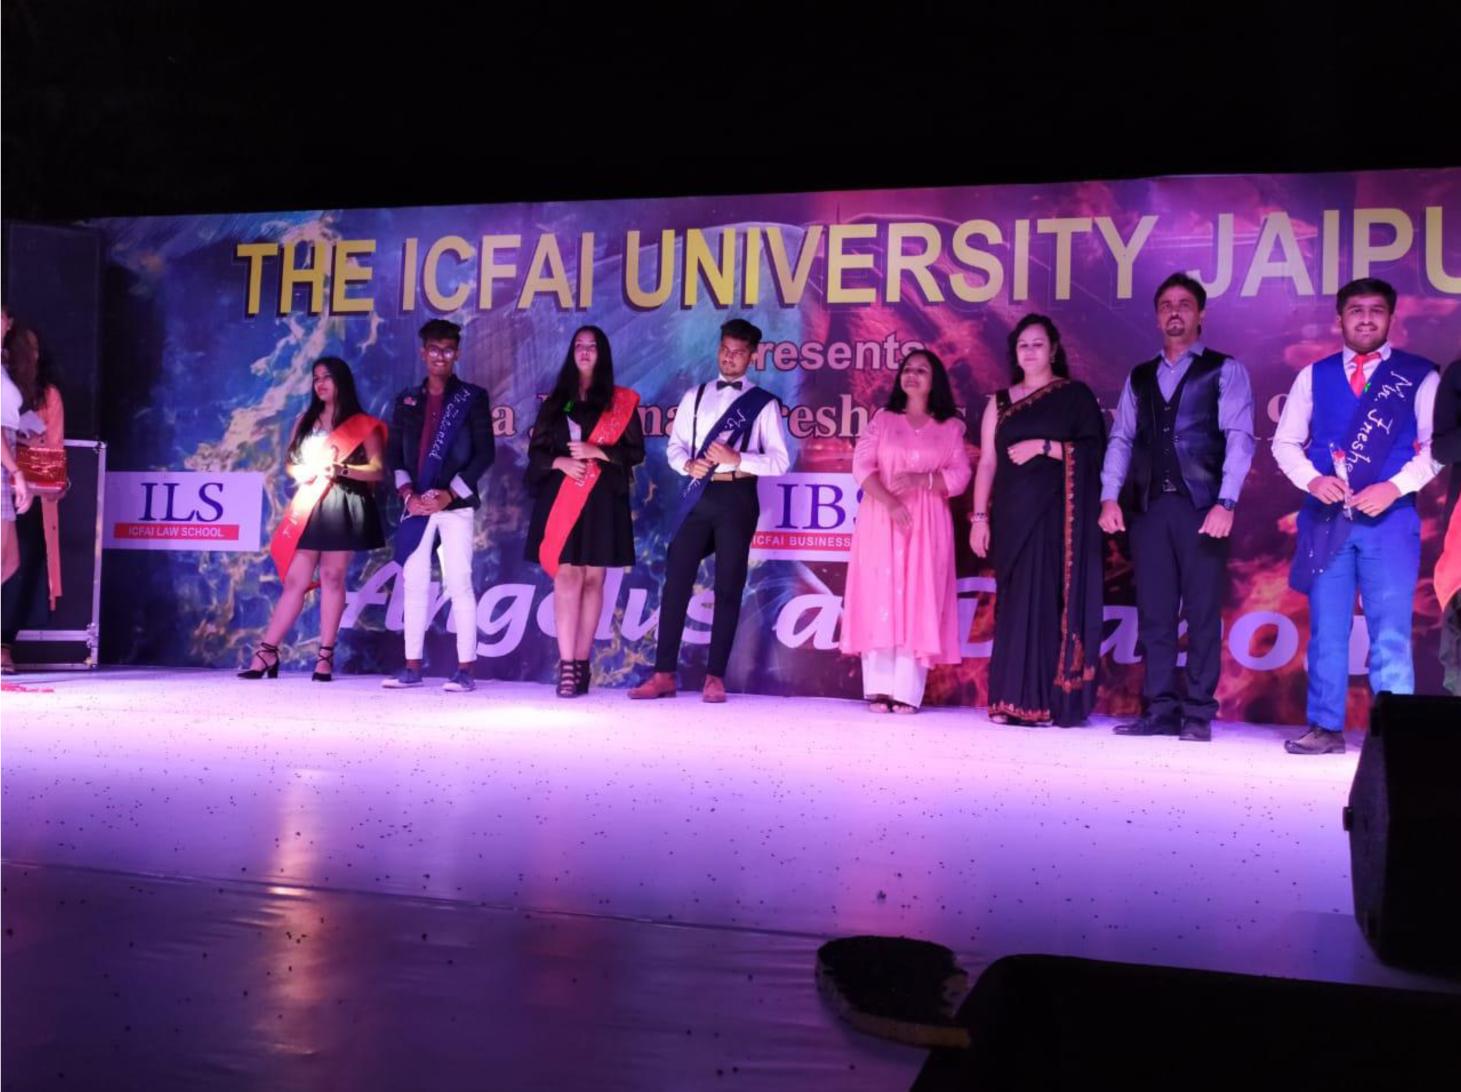 Festa-Julina-2019 ICFAI University, Jaipur